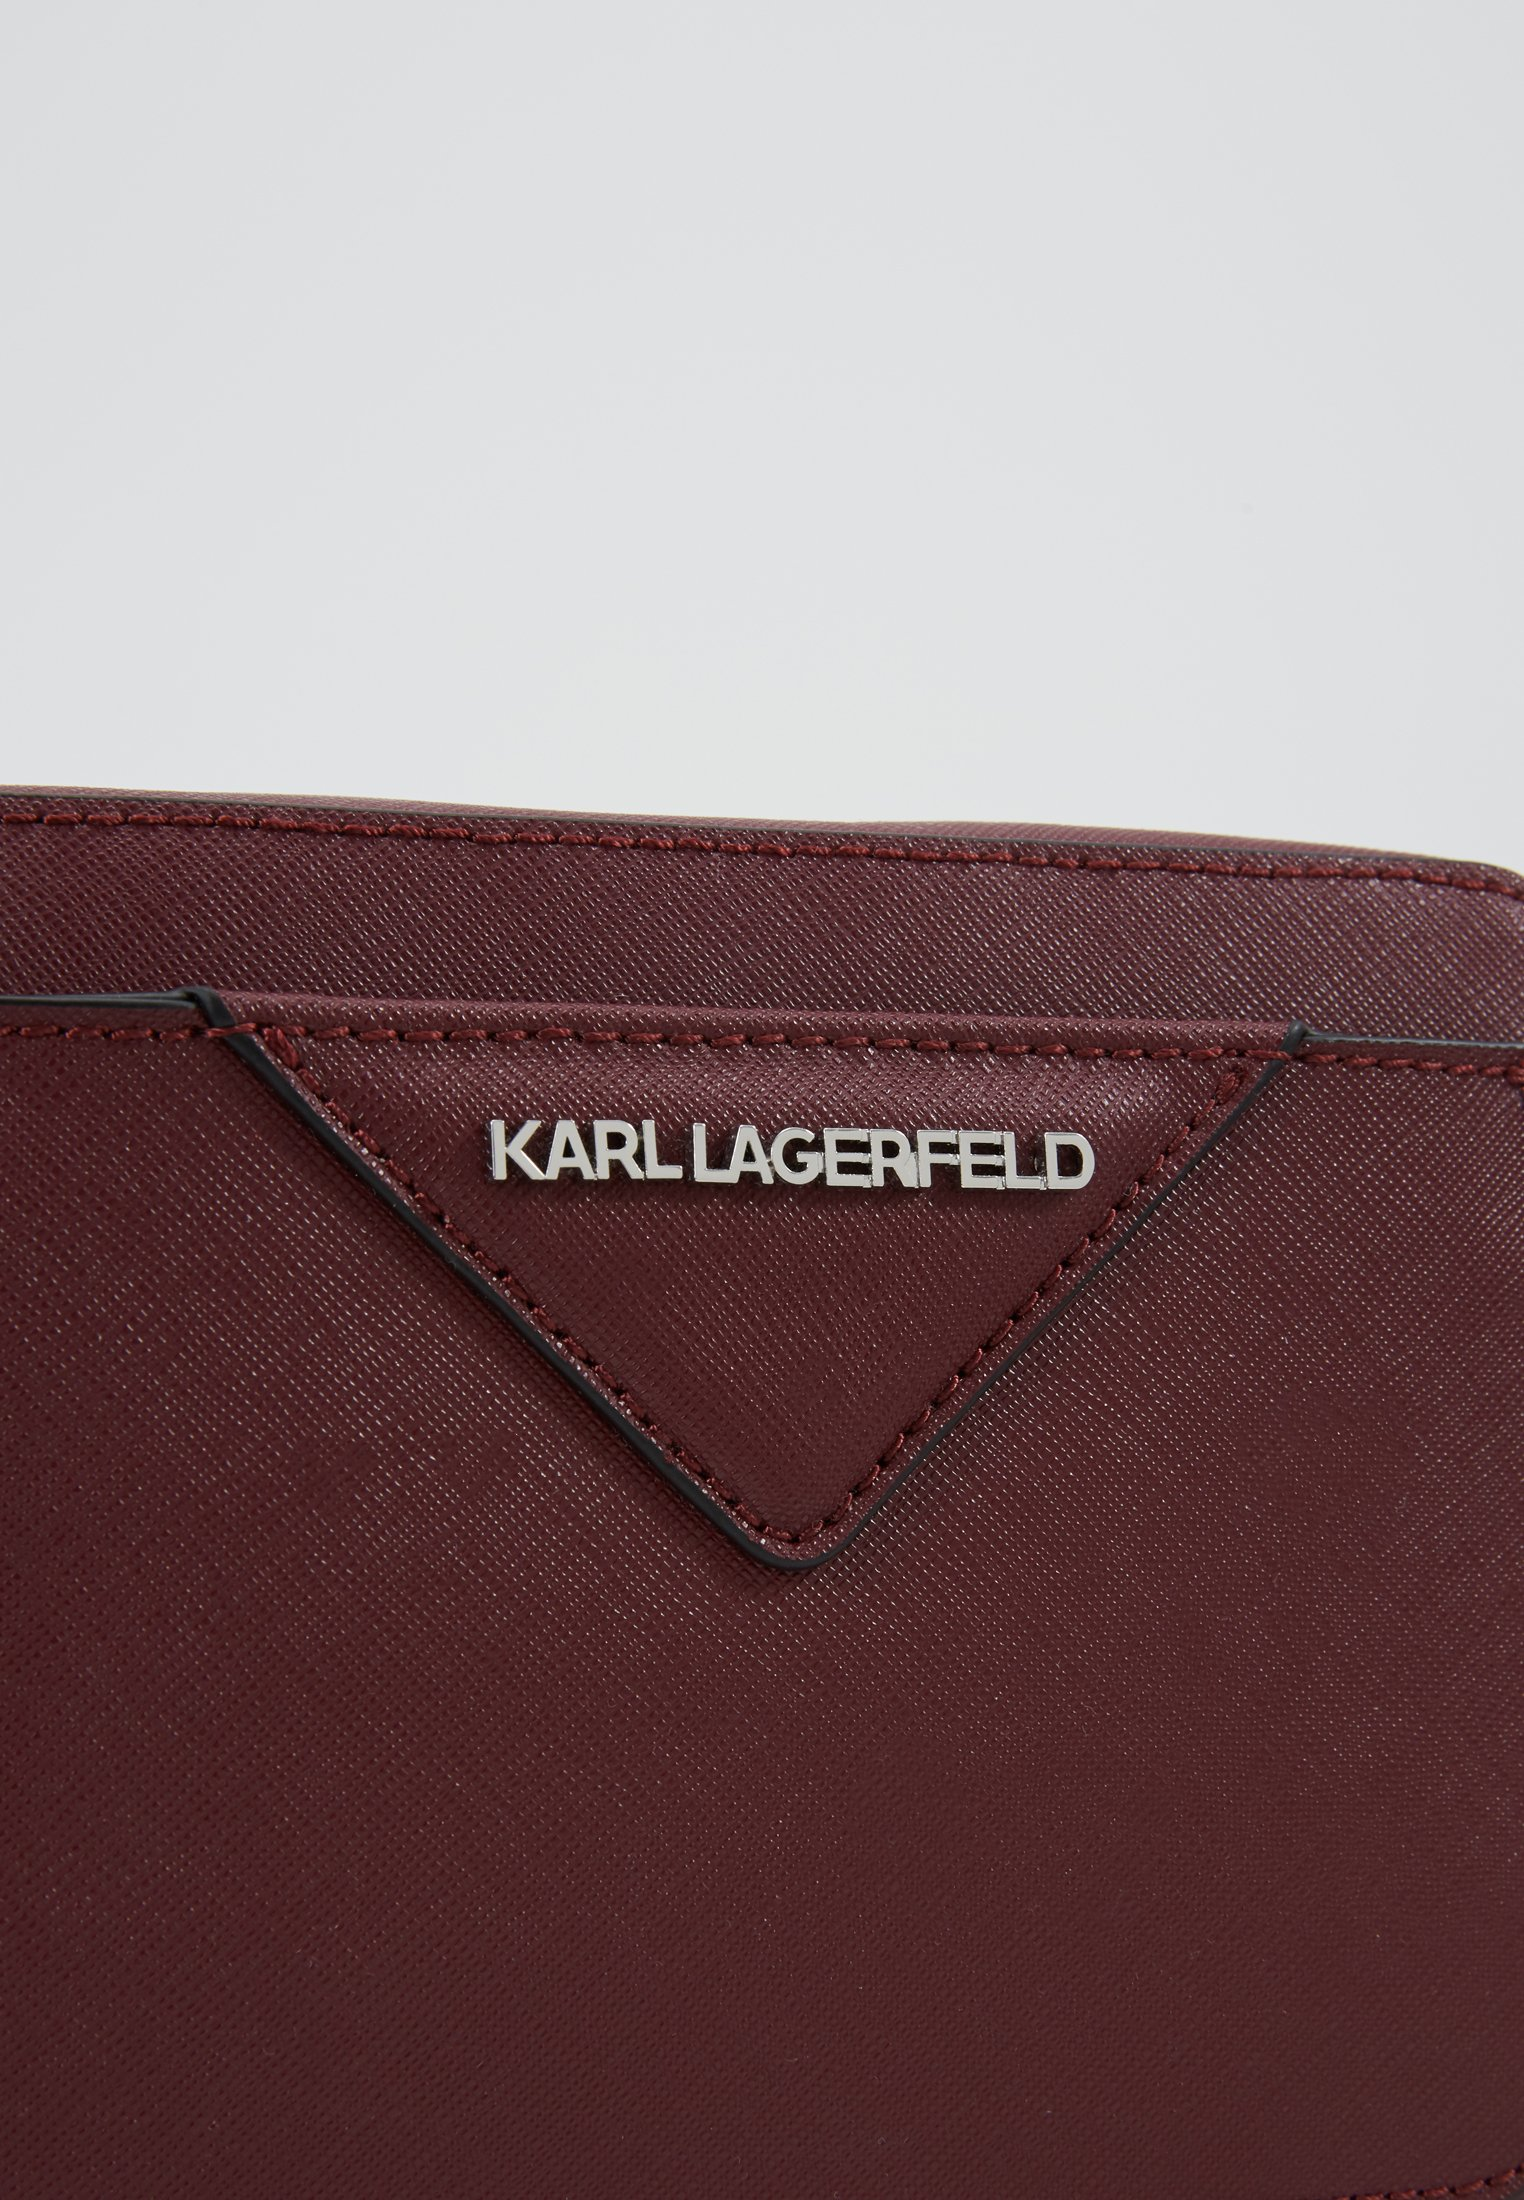 Karl Lagerfeld Camera Wine A Klassik BagBorsa Tracolla FJuTlc1K3